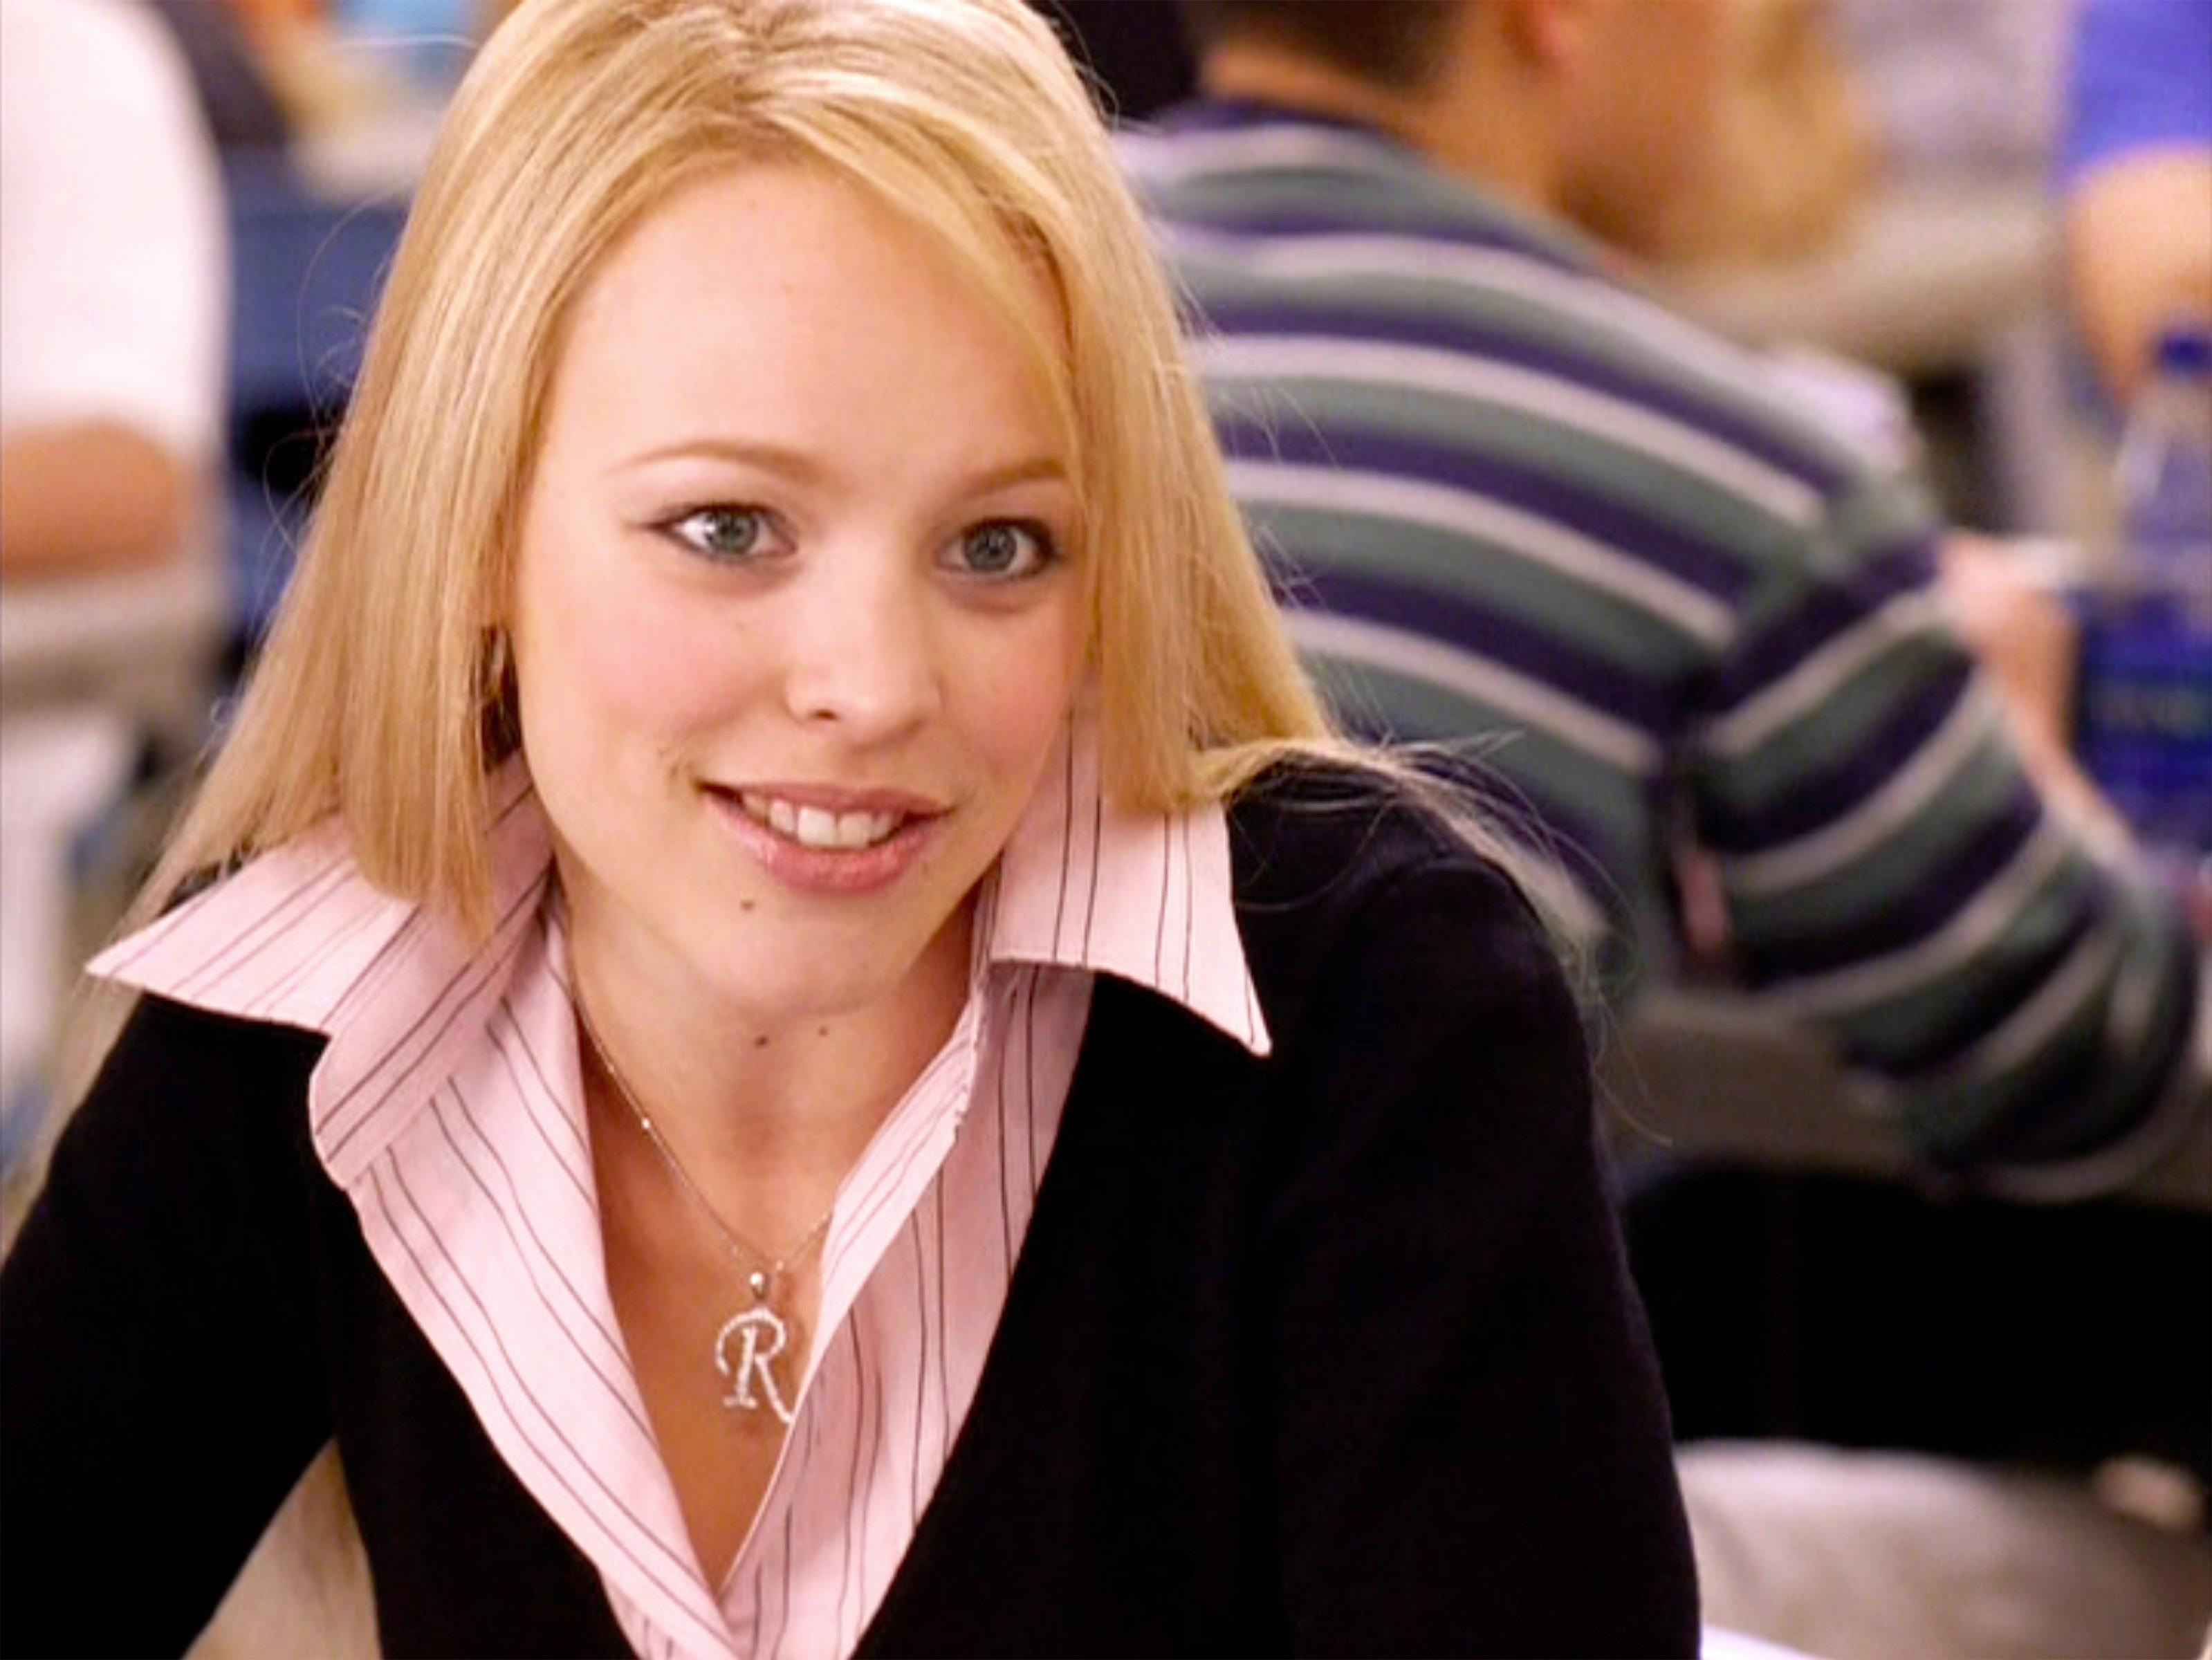 Rachel McAdams in Mean Girls (2004)